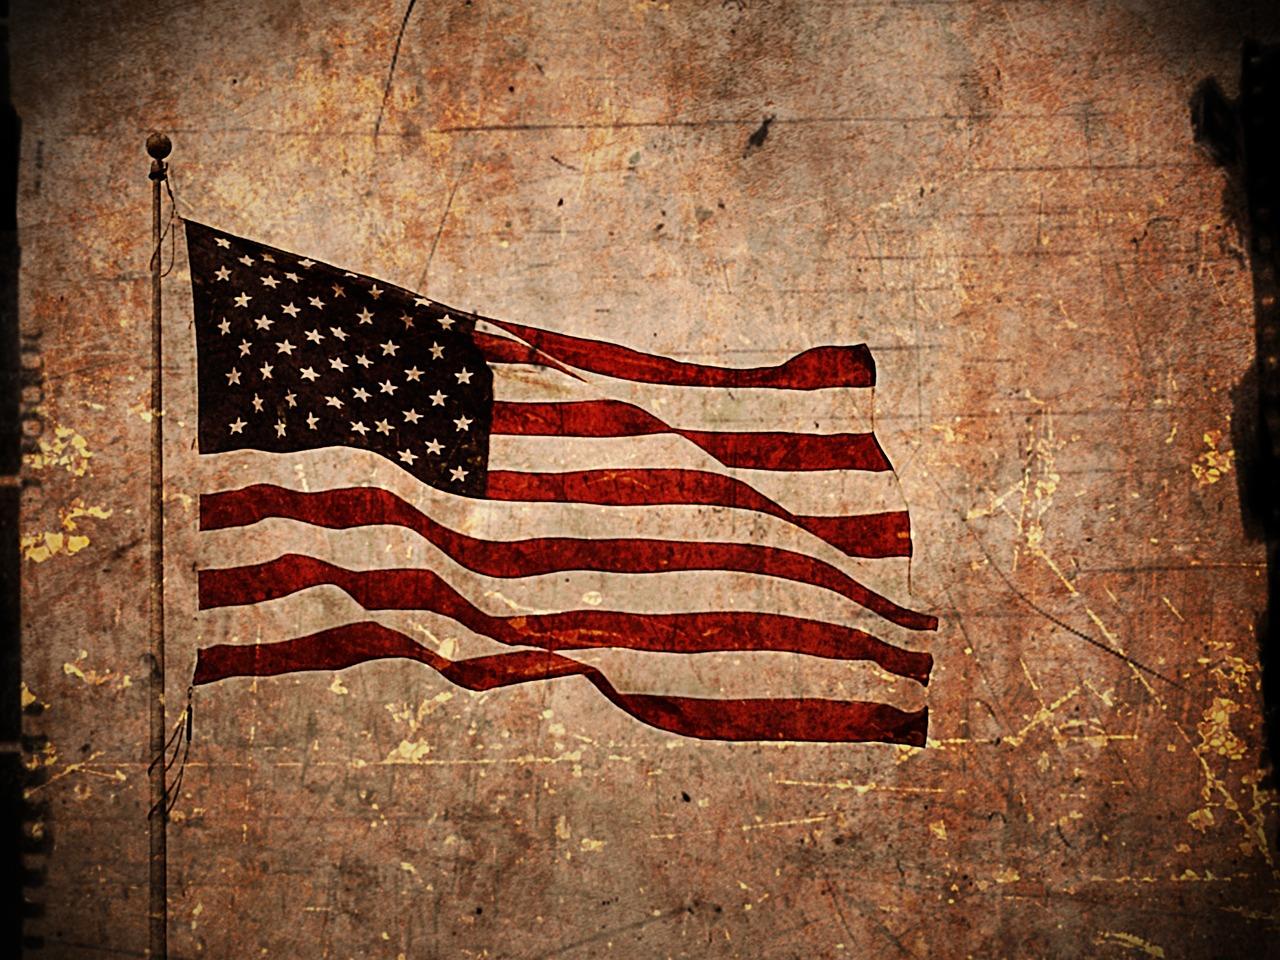 american flag usa u.s. nation country patriot liberty freedom